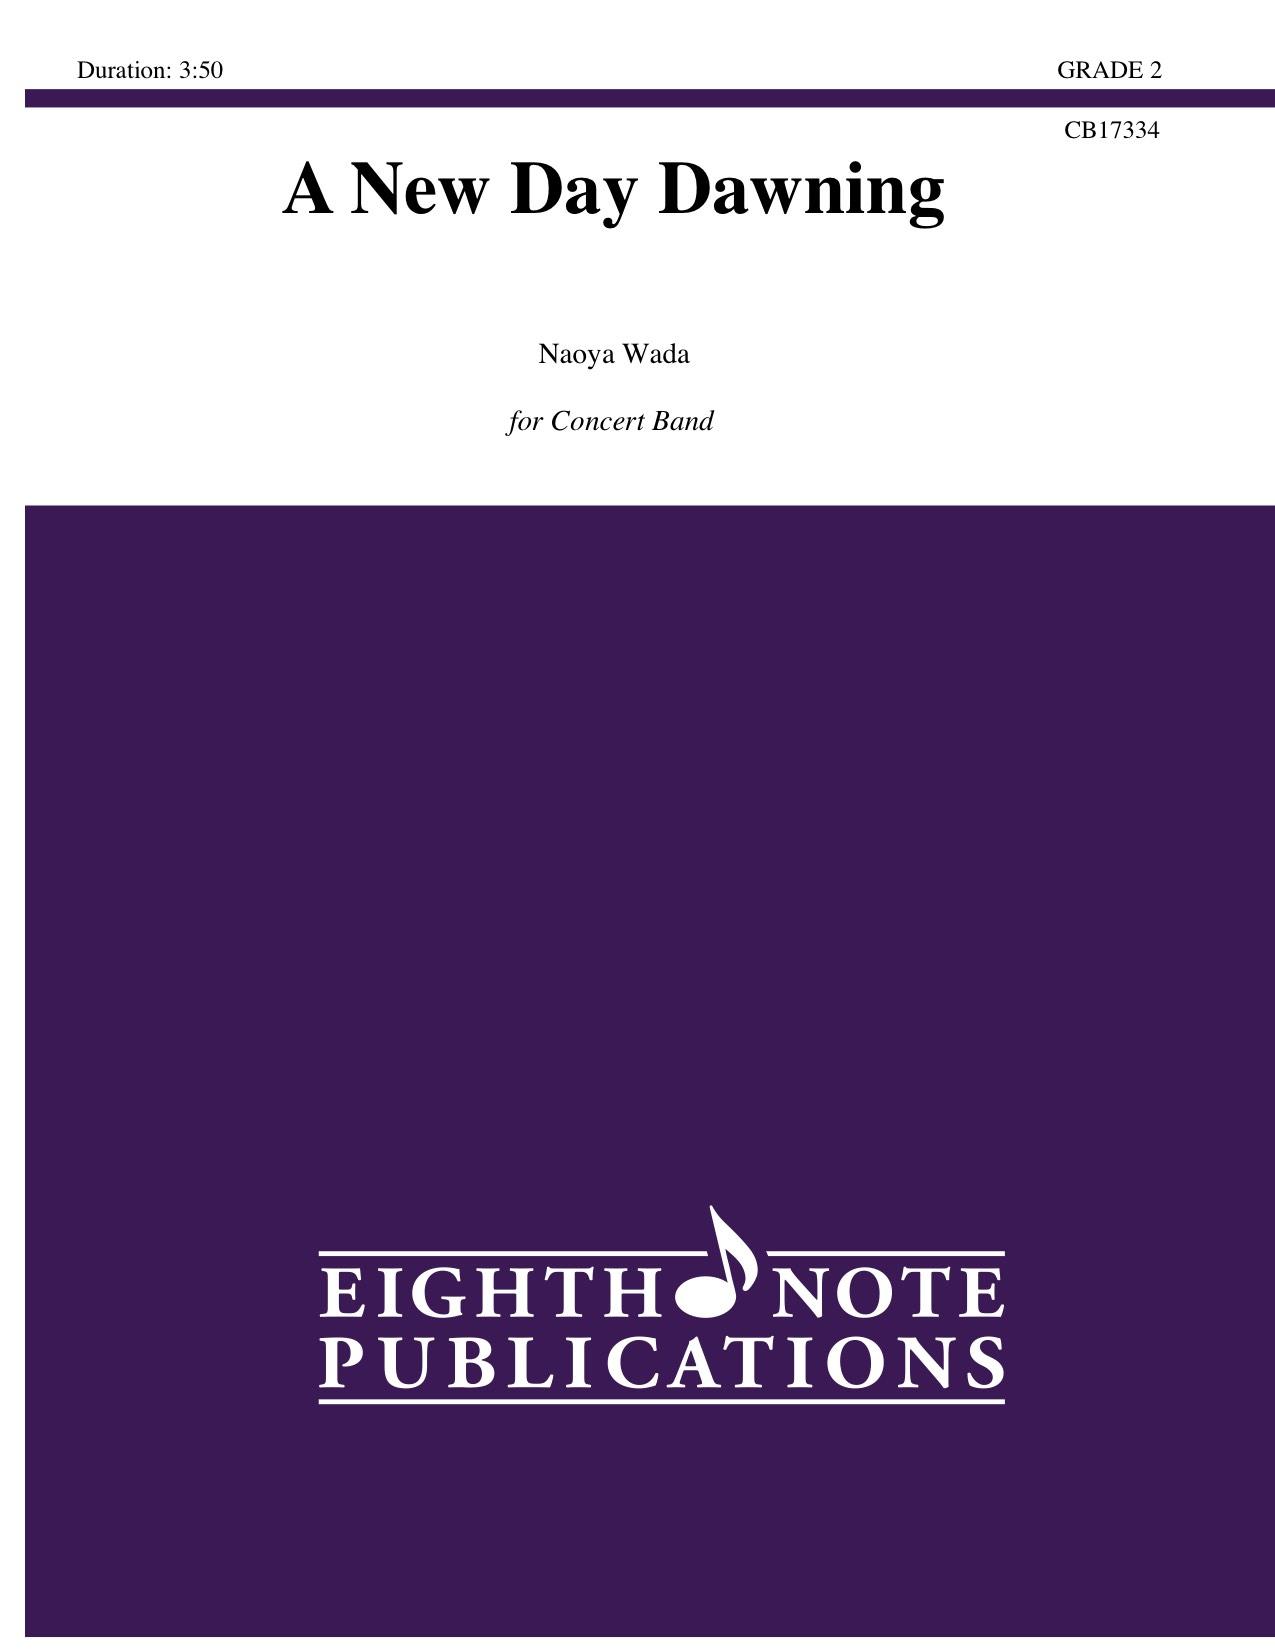 A New Day Dawning - Naoya Wada